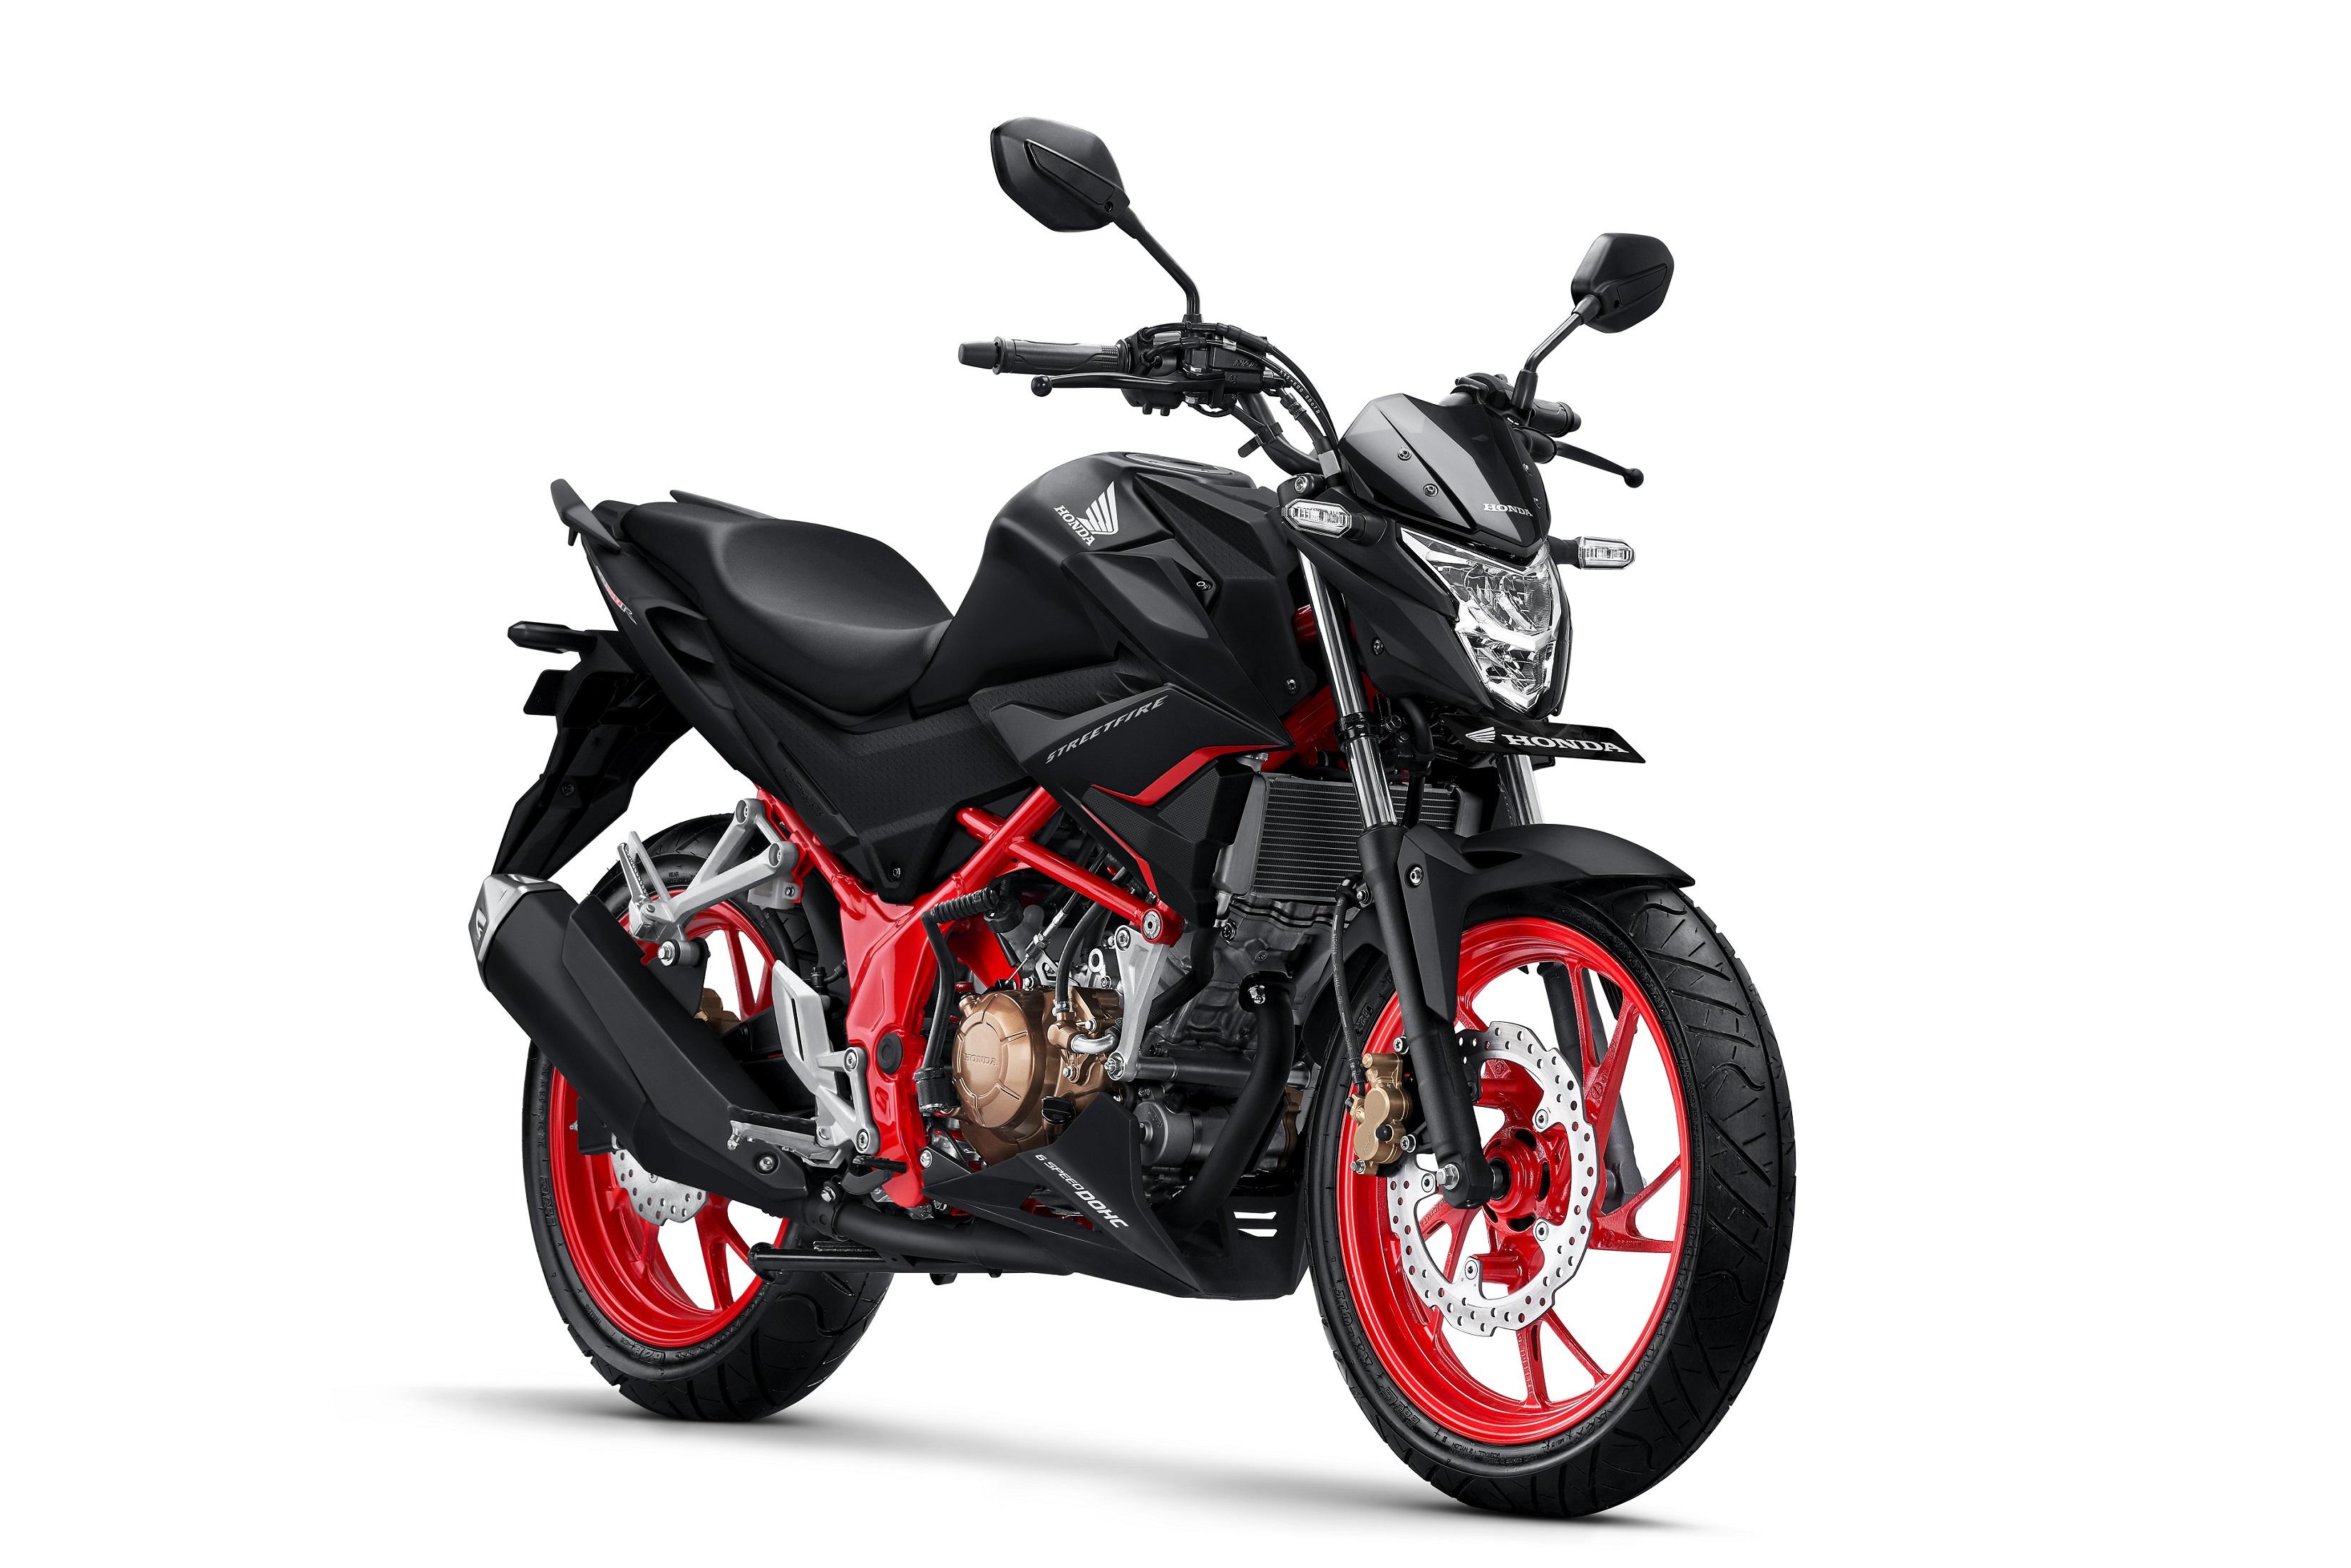 Tampilan Baru New Honda CB150R StreetFire & New Honda CBR250RR